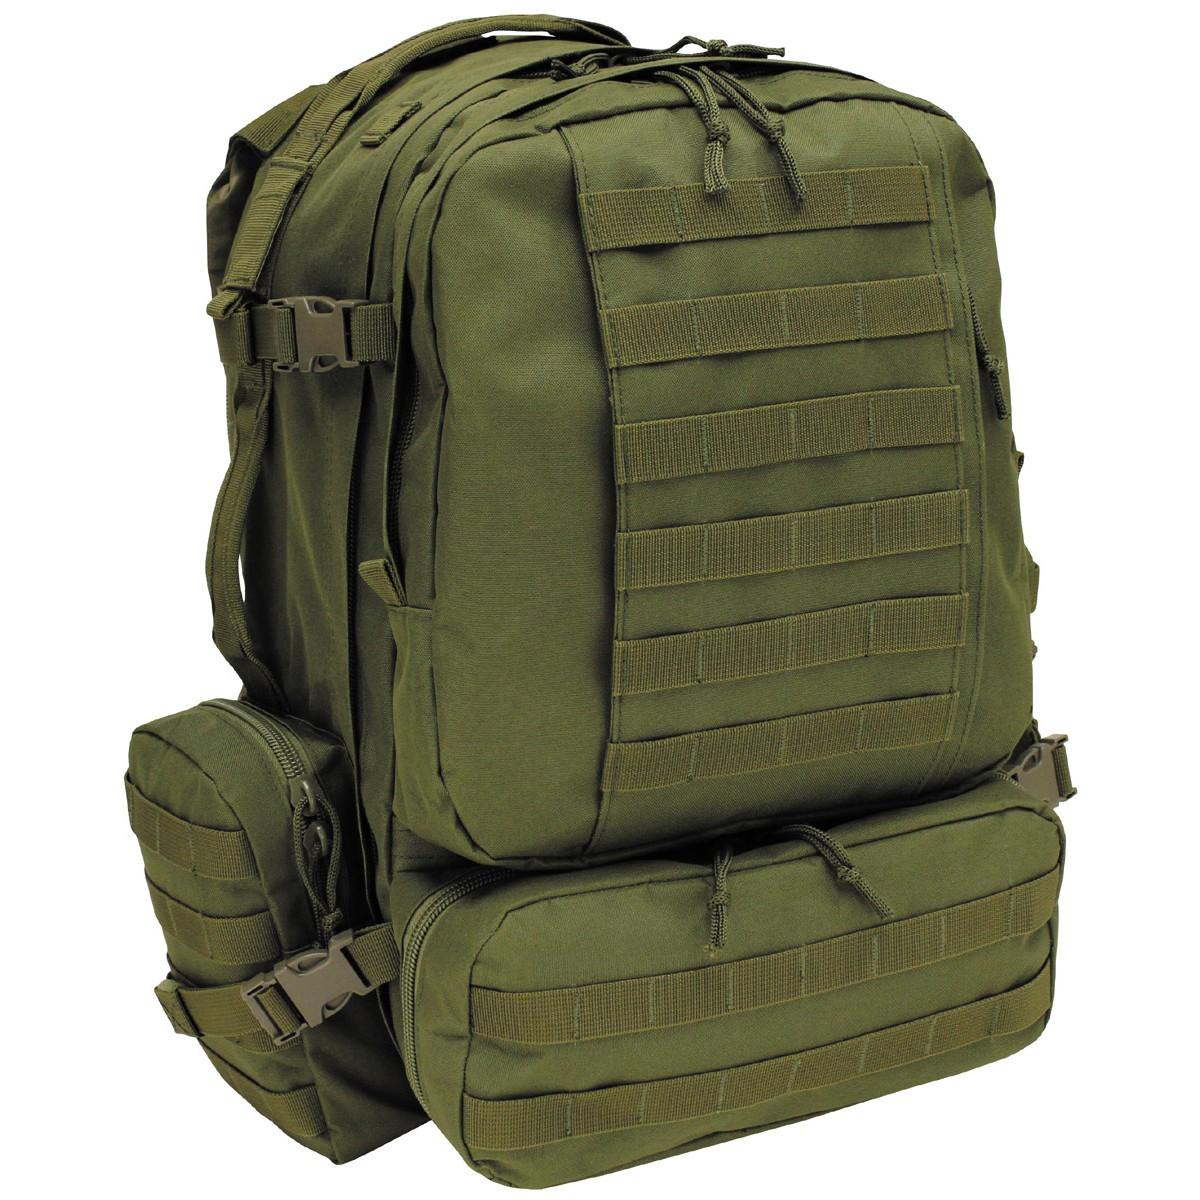 Ranac Tactical Modular zeleni